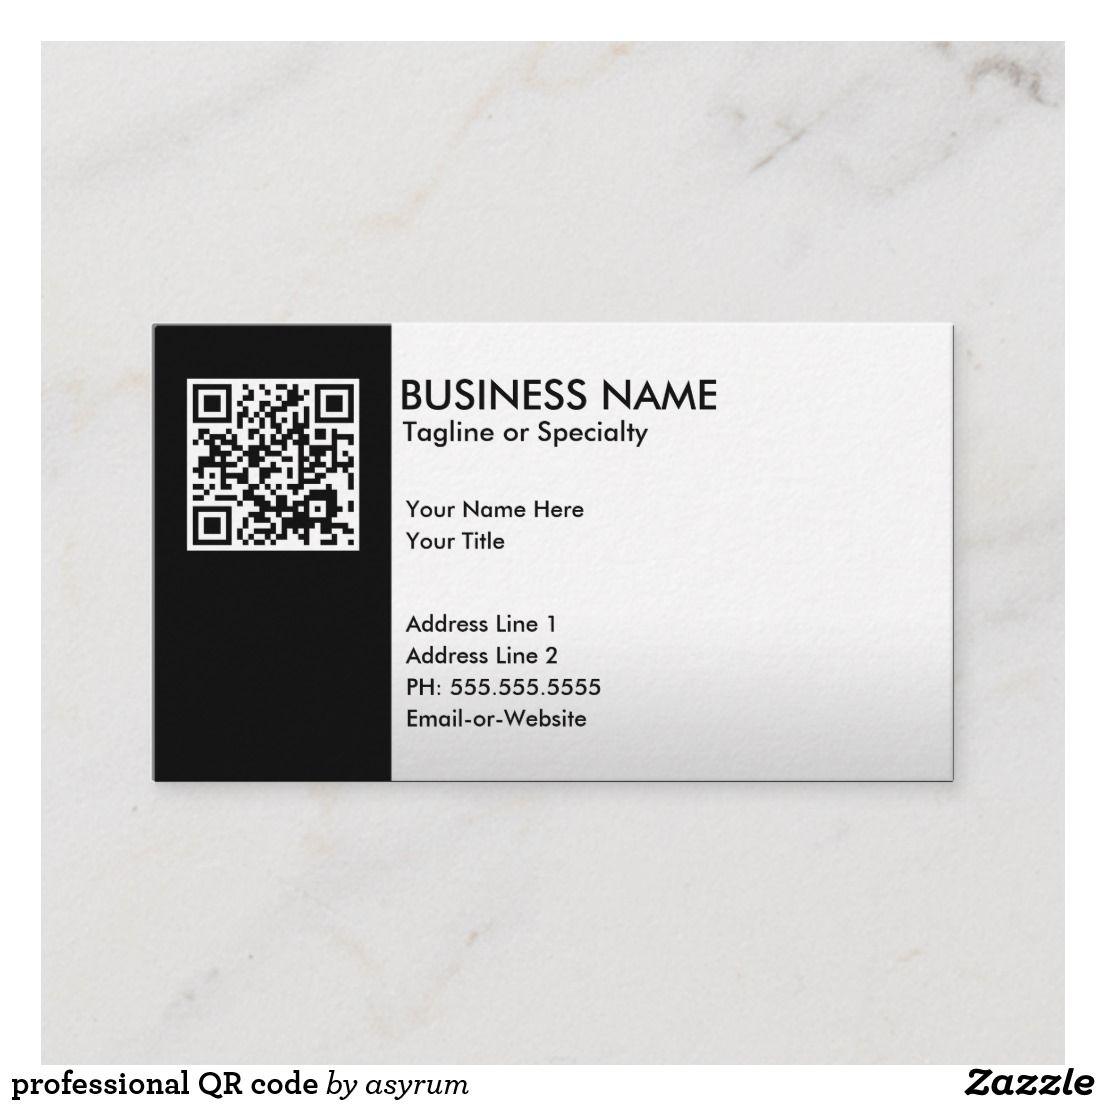 Professional Qr Code Business Card Zazzle Com Qr Code Business Card Metal Business Cards Business Cards